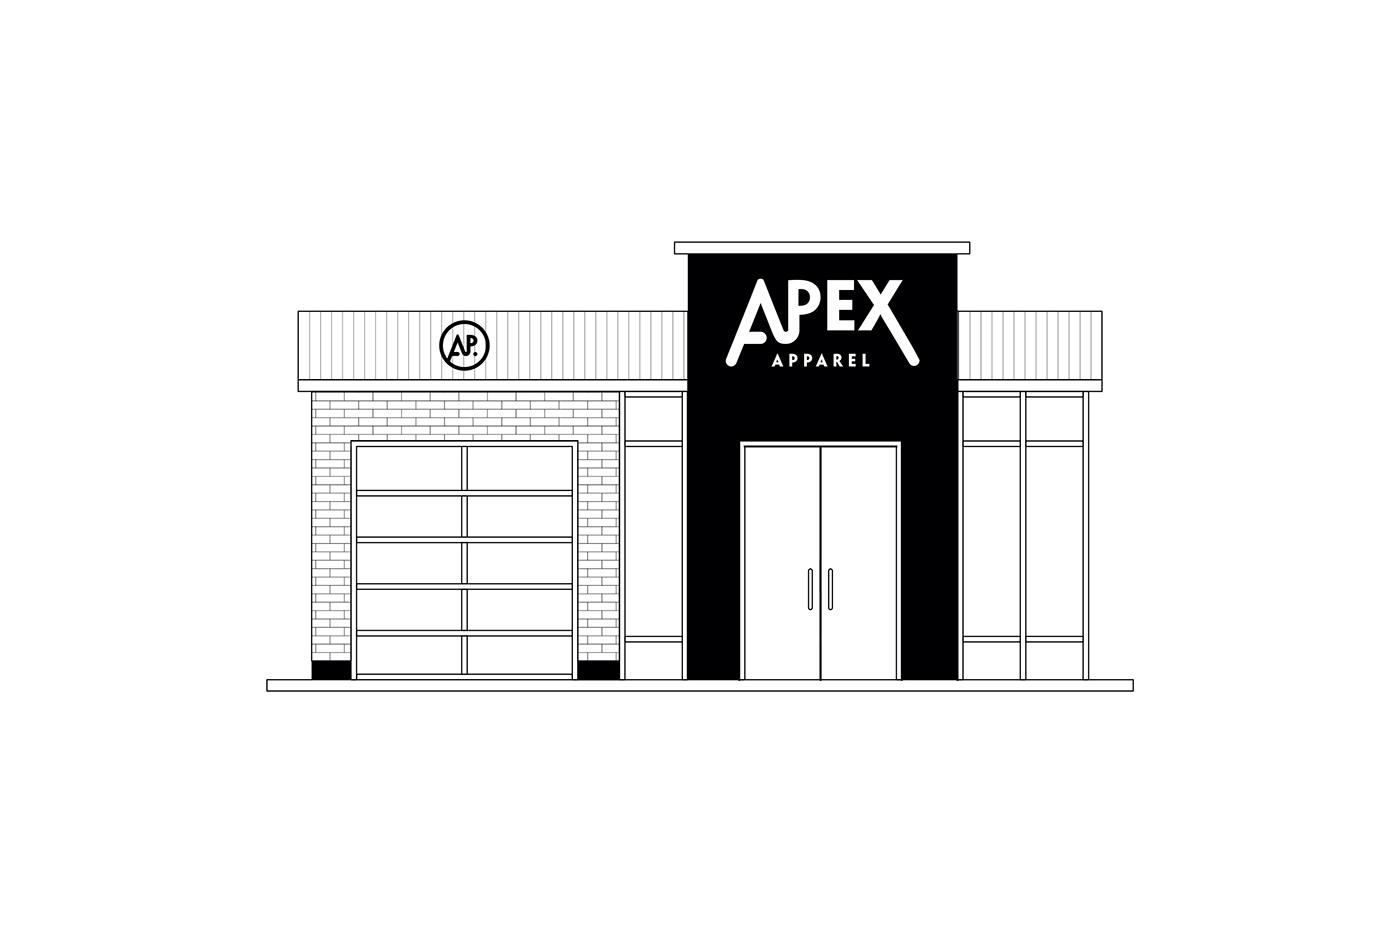 drif Clothing Apex apparel Cars graphic design